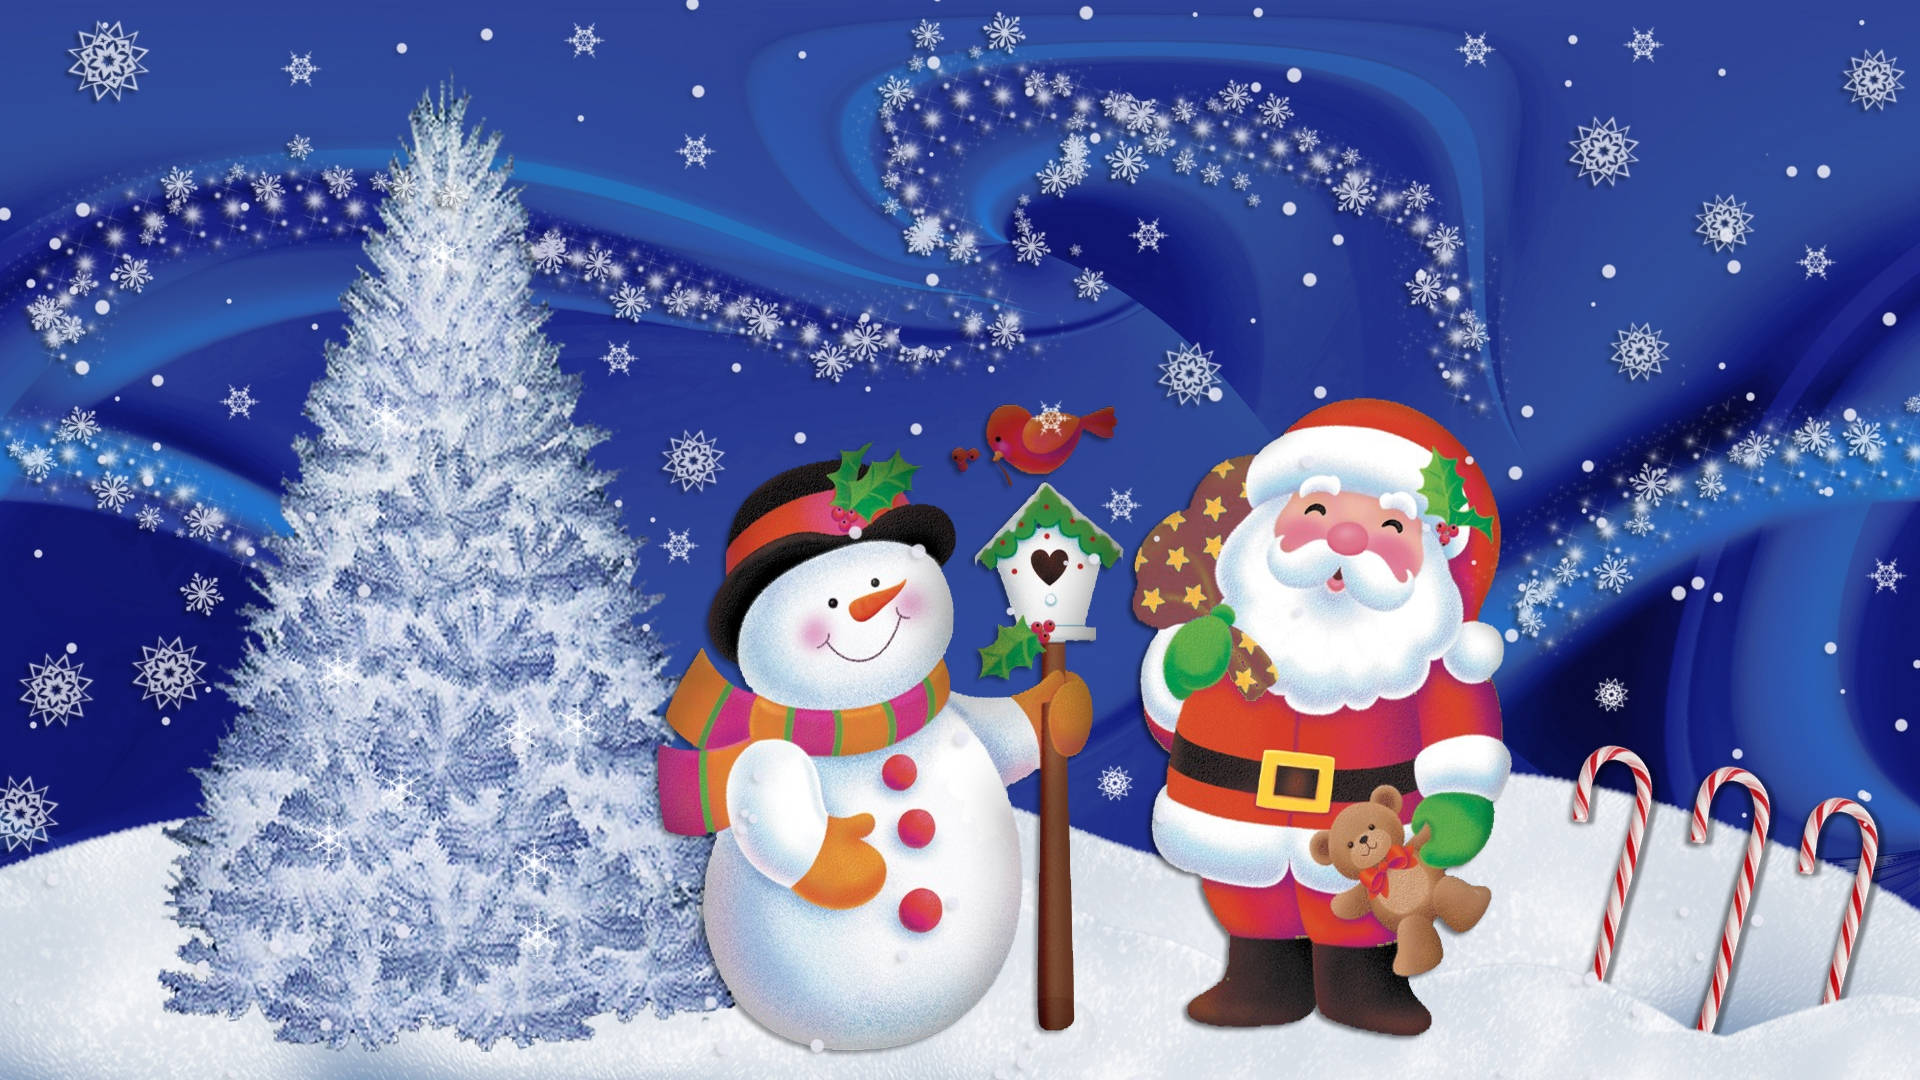 Free Christmas Screensavers wallpaper | 1680x1050 | #79340